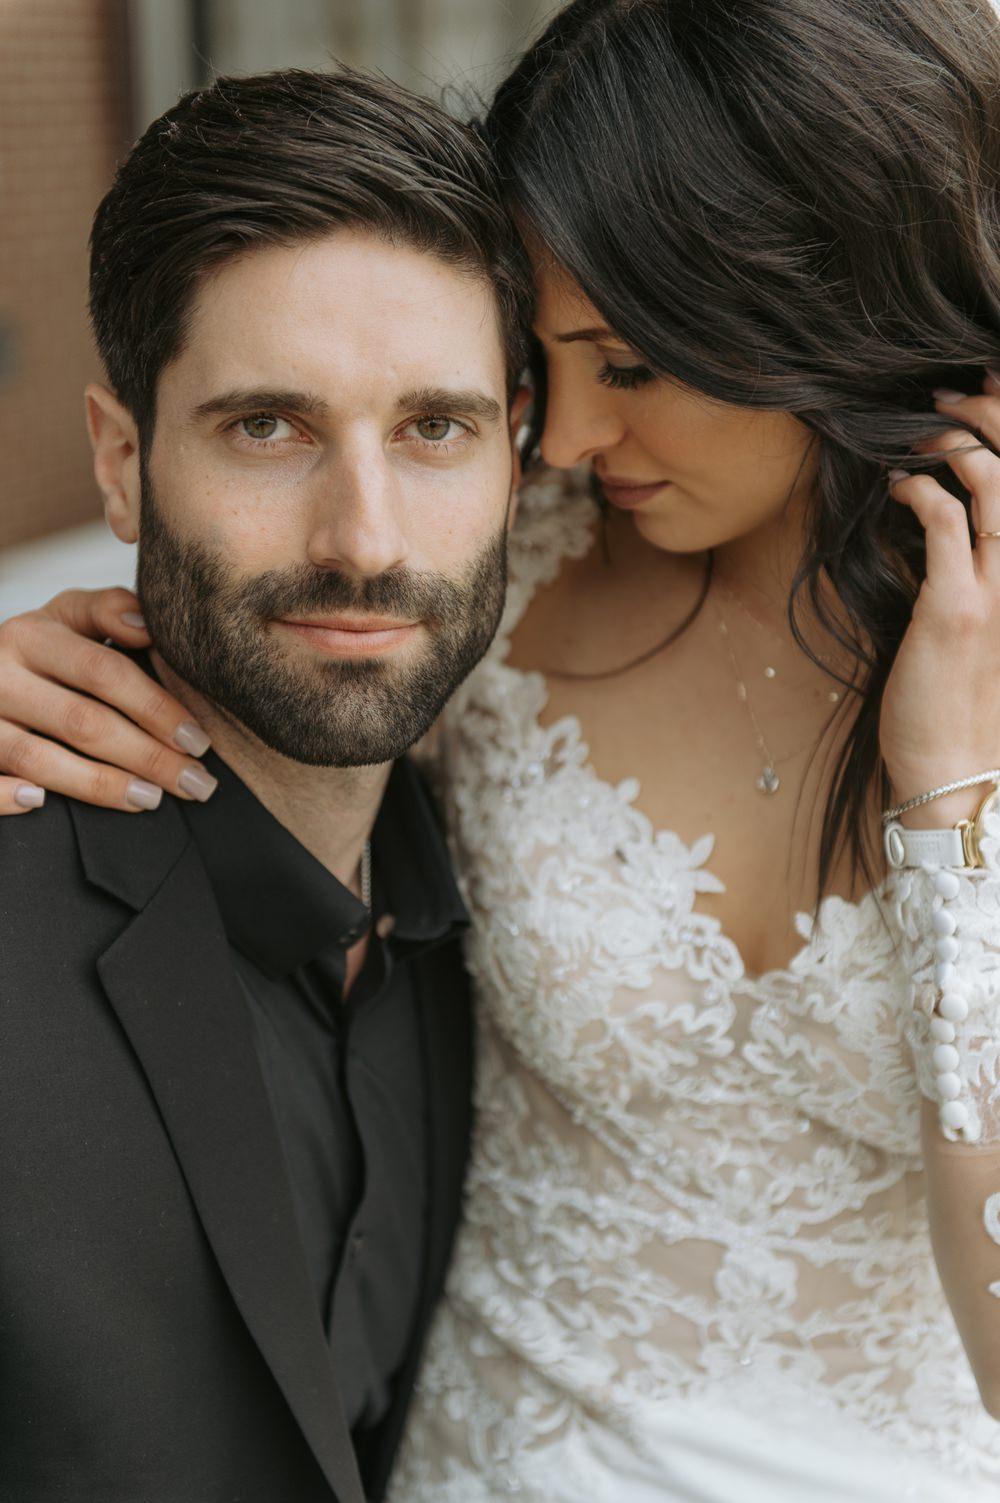 Groom Black Suit Tie Shirt Open Collar Greenhouse Michigan Wedding Jean Smith Photography